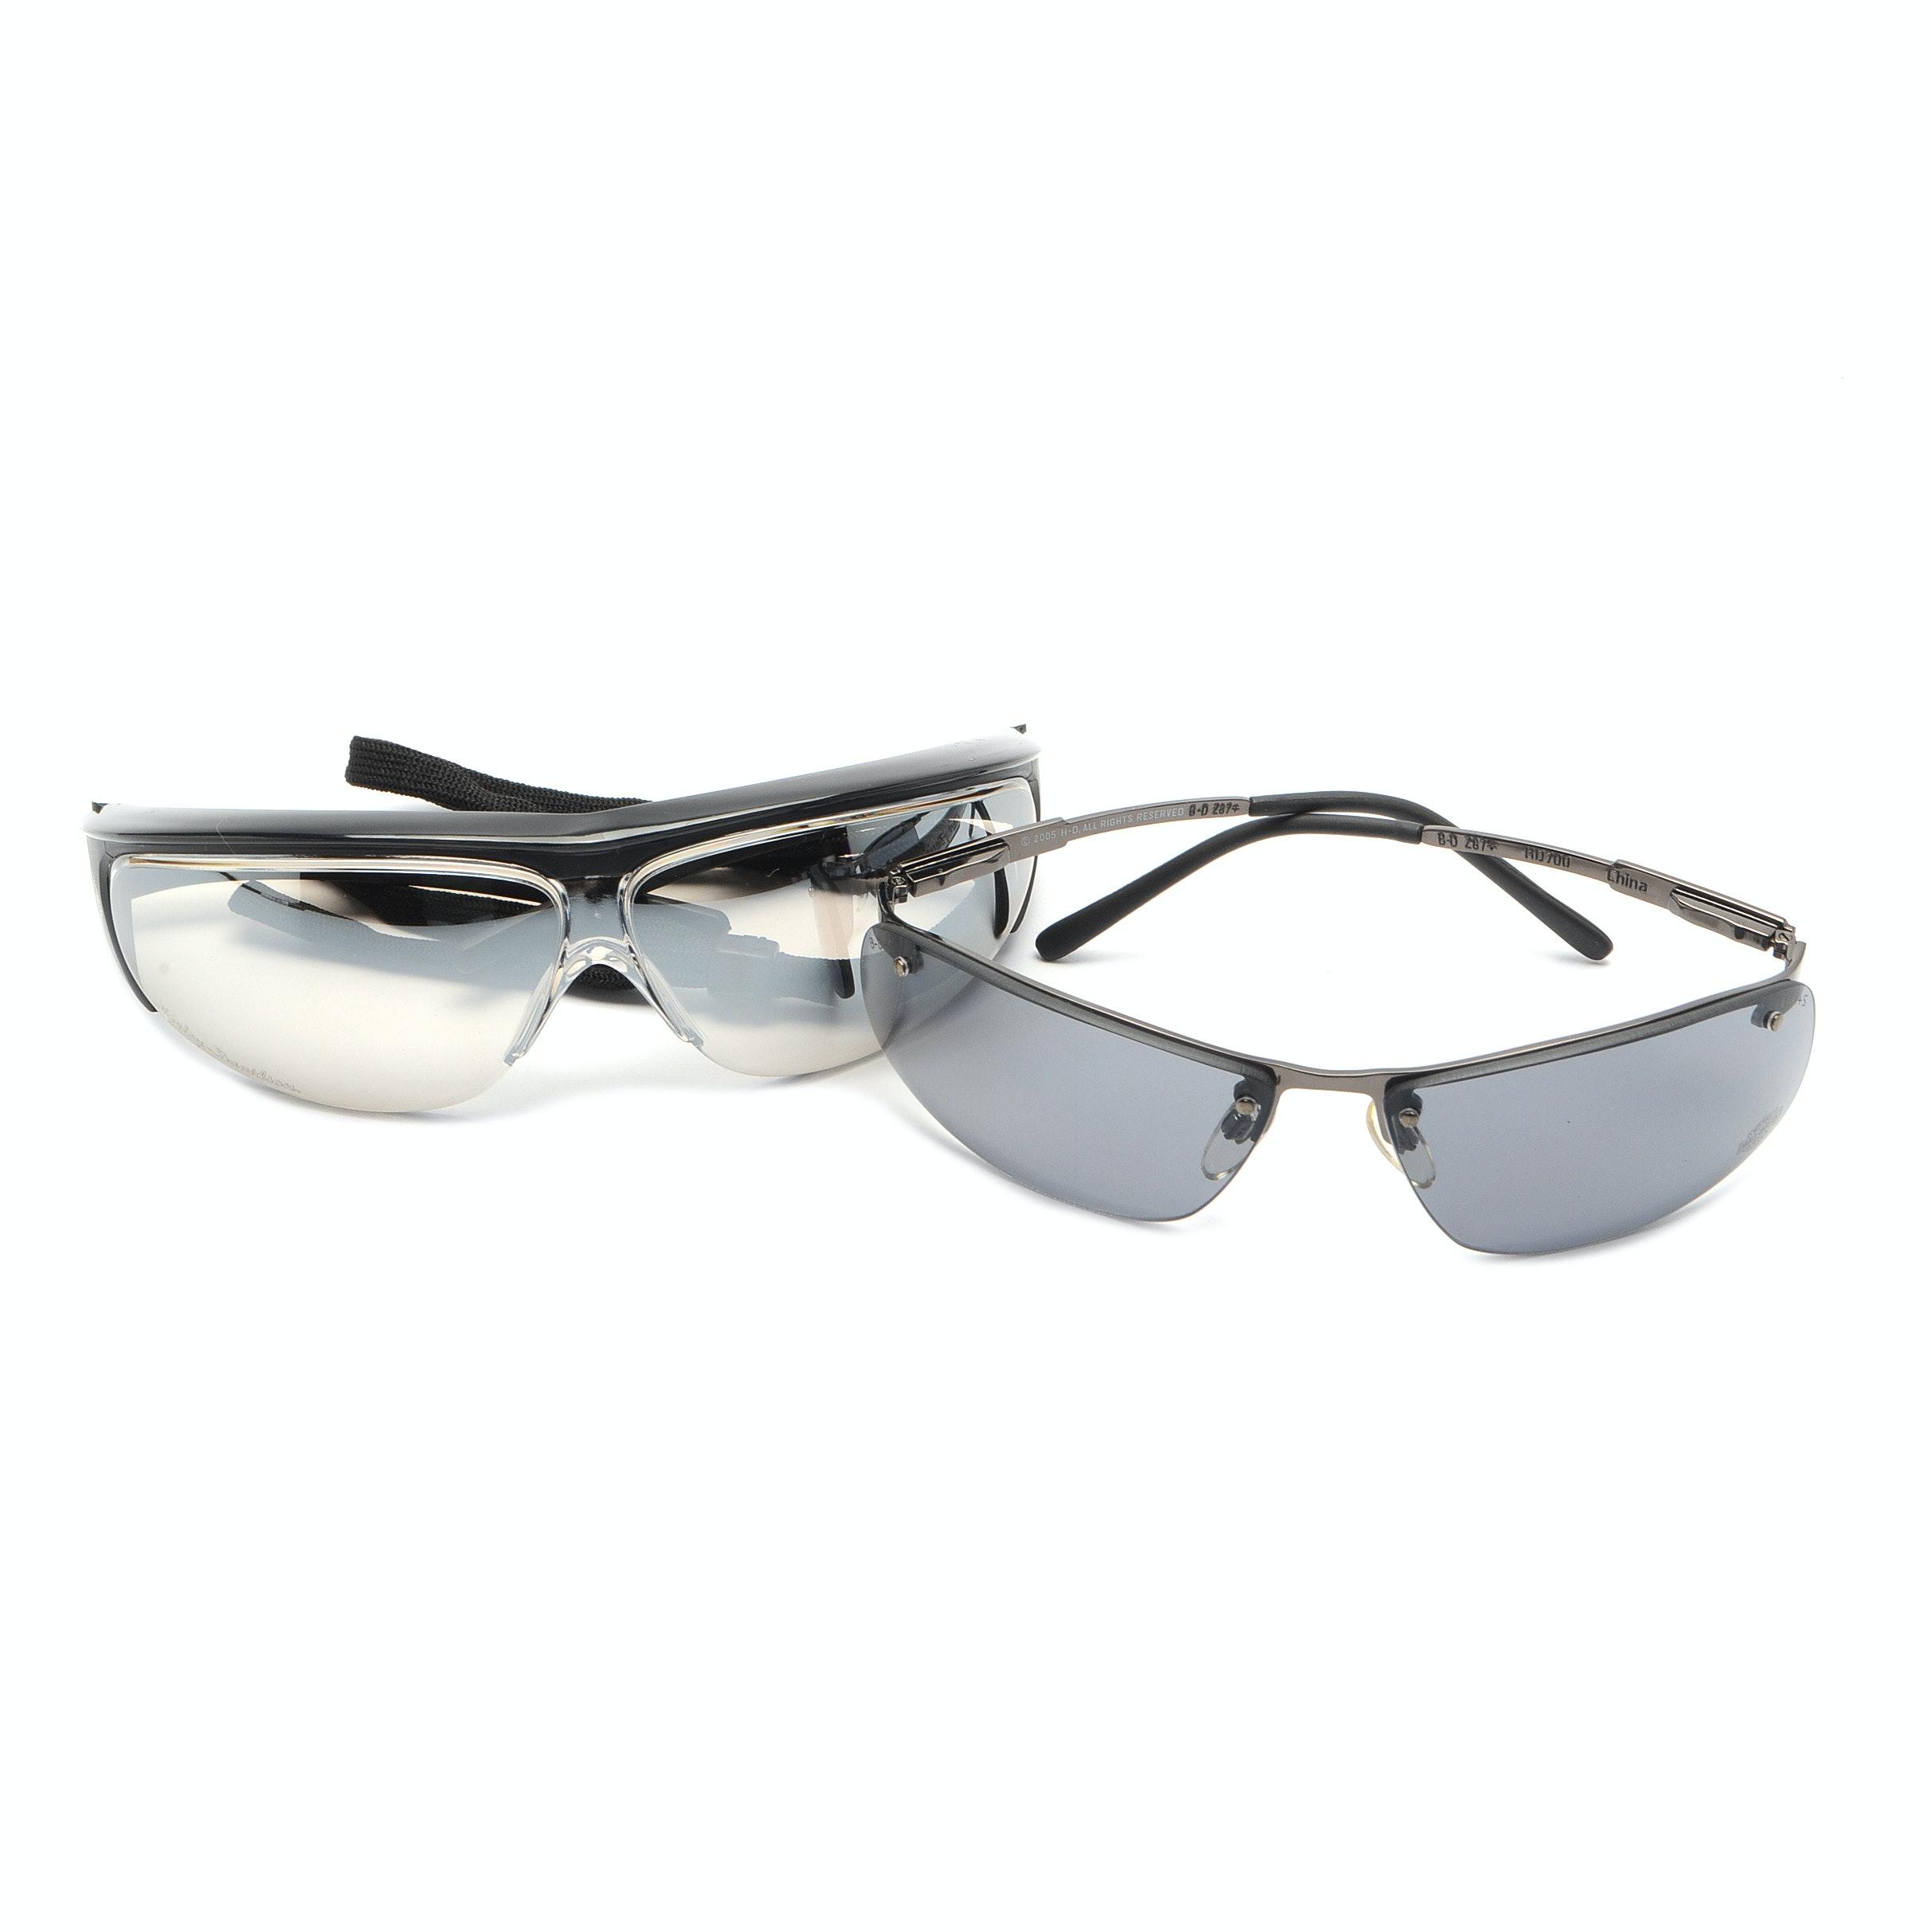 Harley Davidson Safety Eyewear Sunglasses Ebth